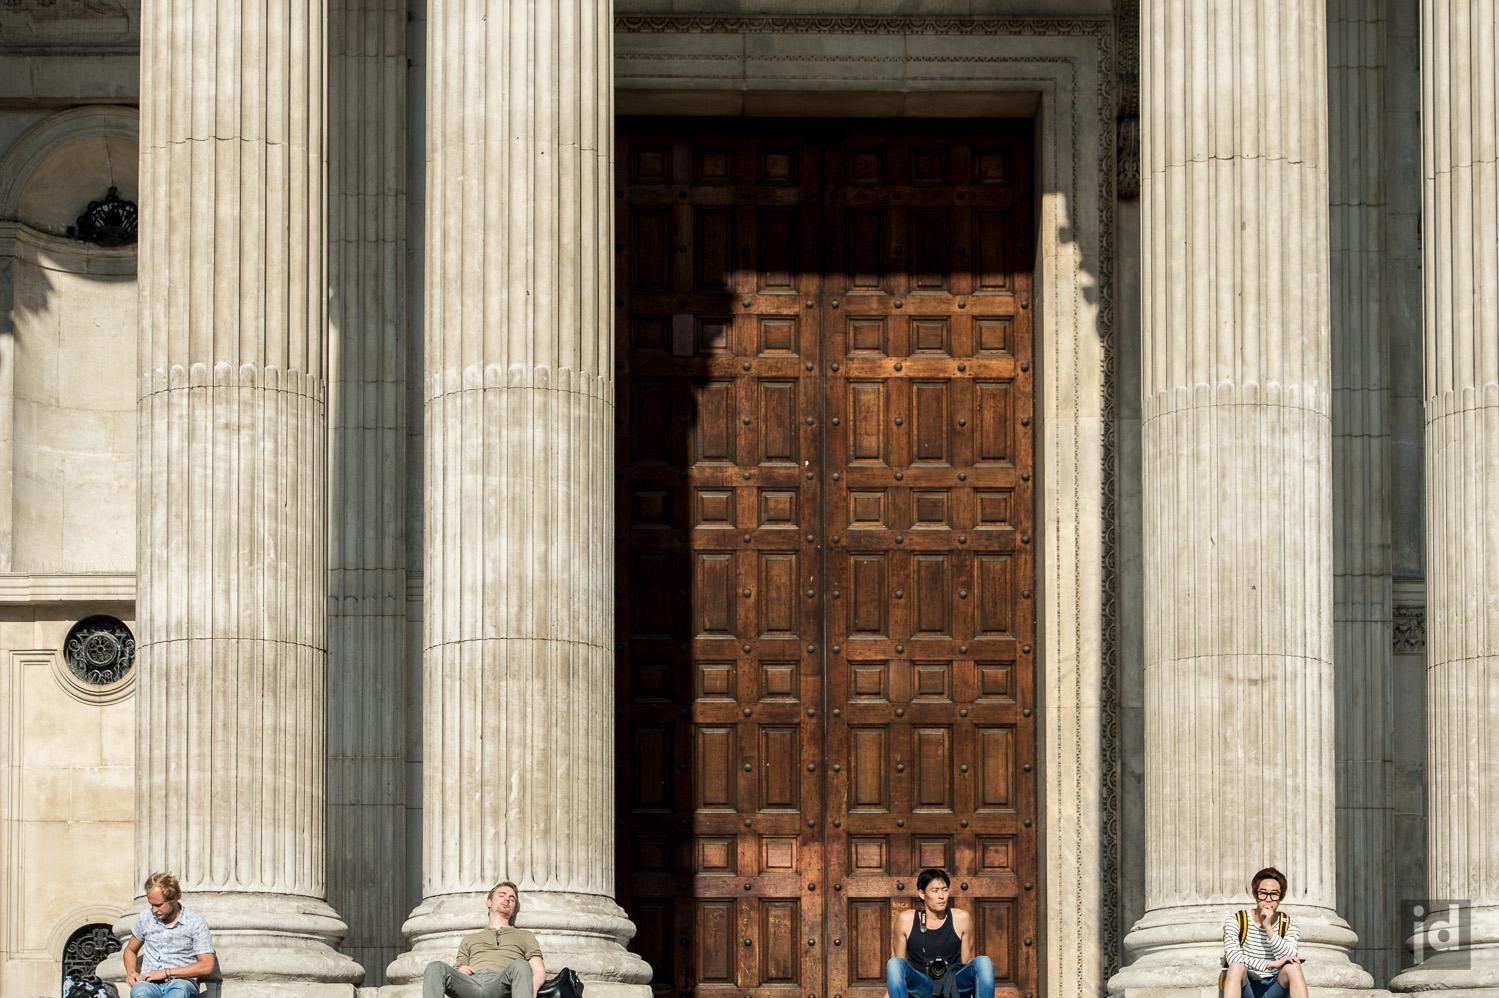 London_Photography_Jason_Davis_Images_001-3.jpg